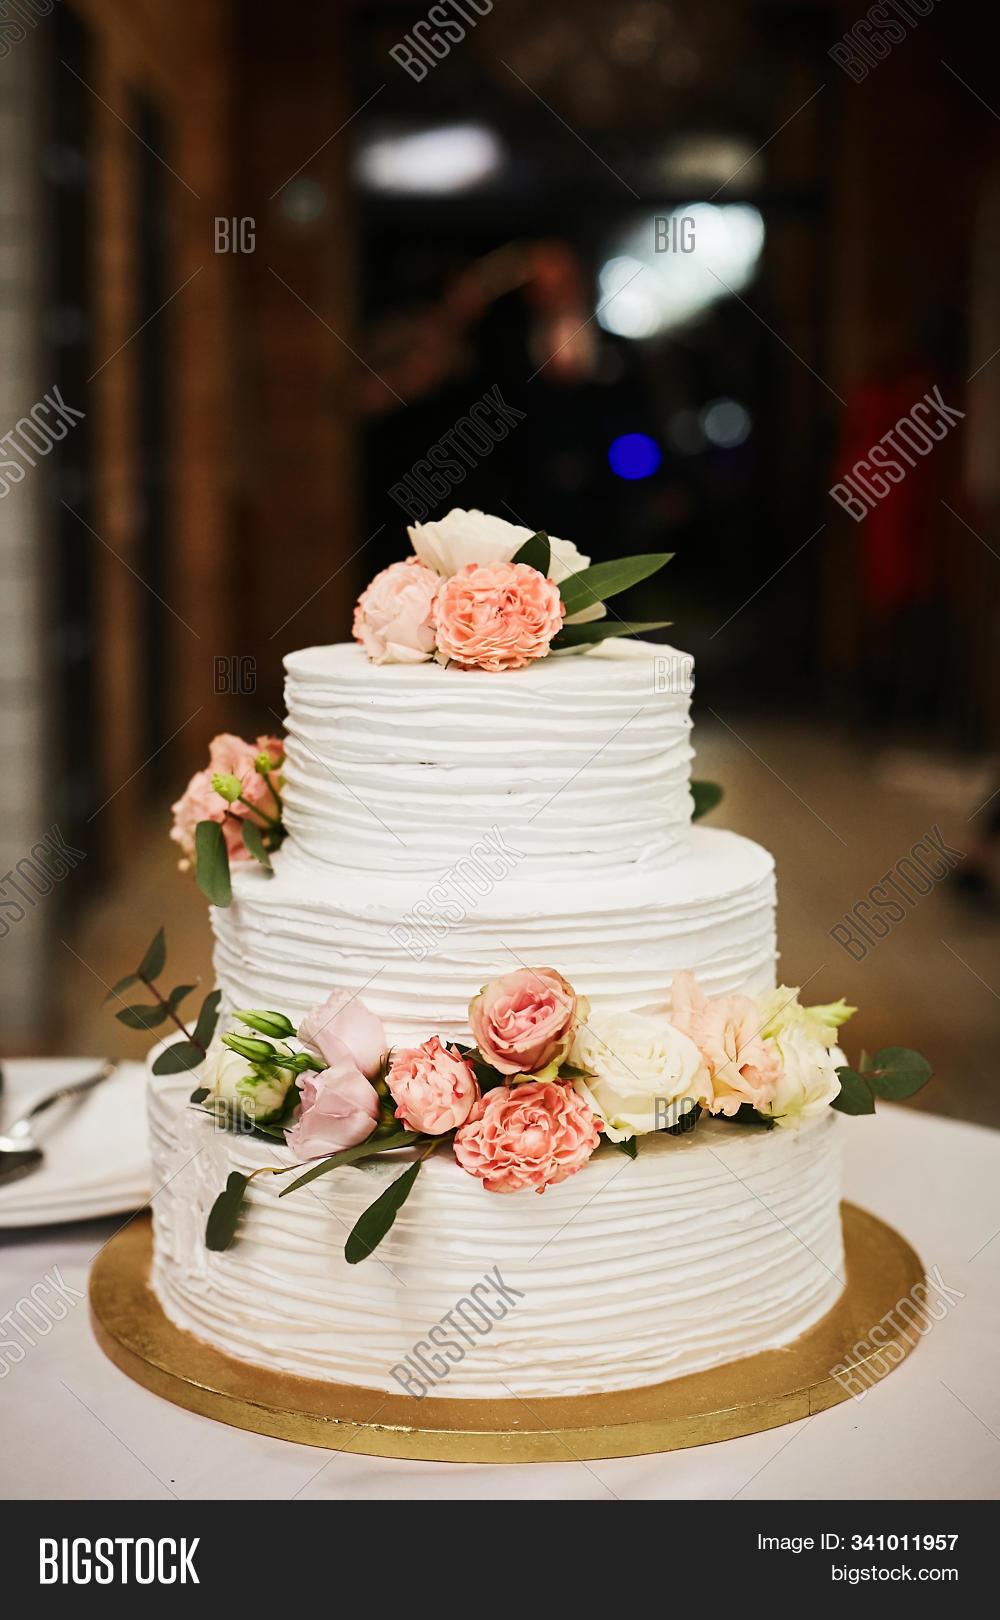 Cool White Wedding Cake Image Photo Free Trial Bigstock Funny Birthday Cards Online Necthendildamsfinfo